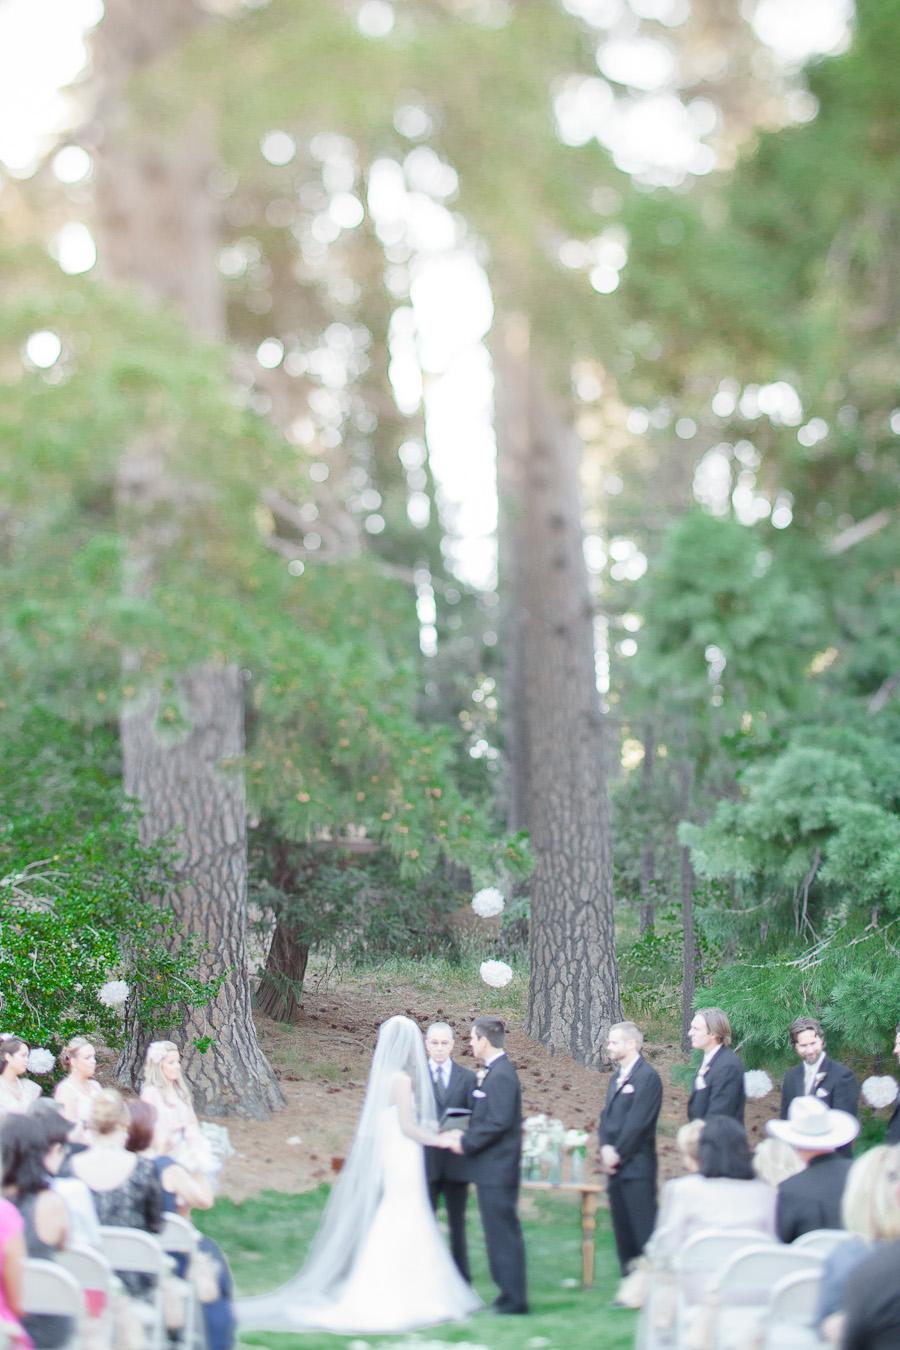 fine art wedding photography, forest wedding, lake arrowhead wedding, big bear wedding, fine art wedding portraiture, soft light